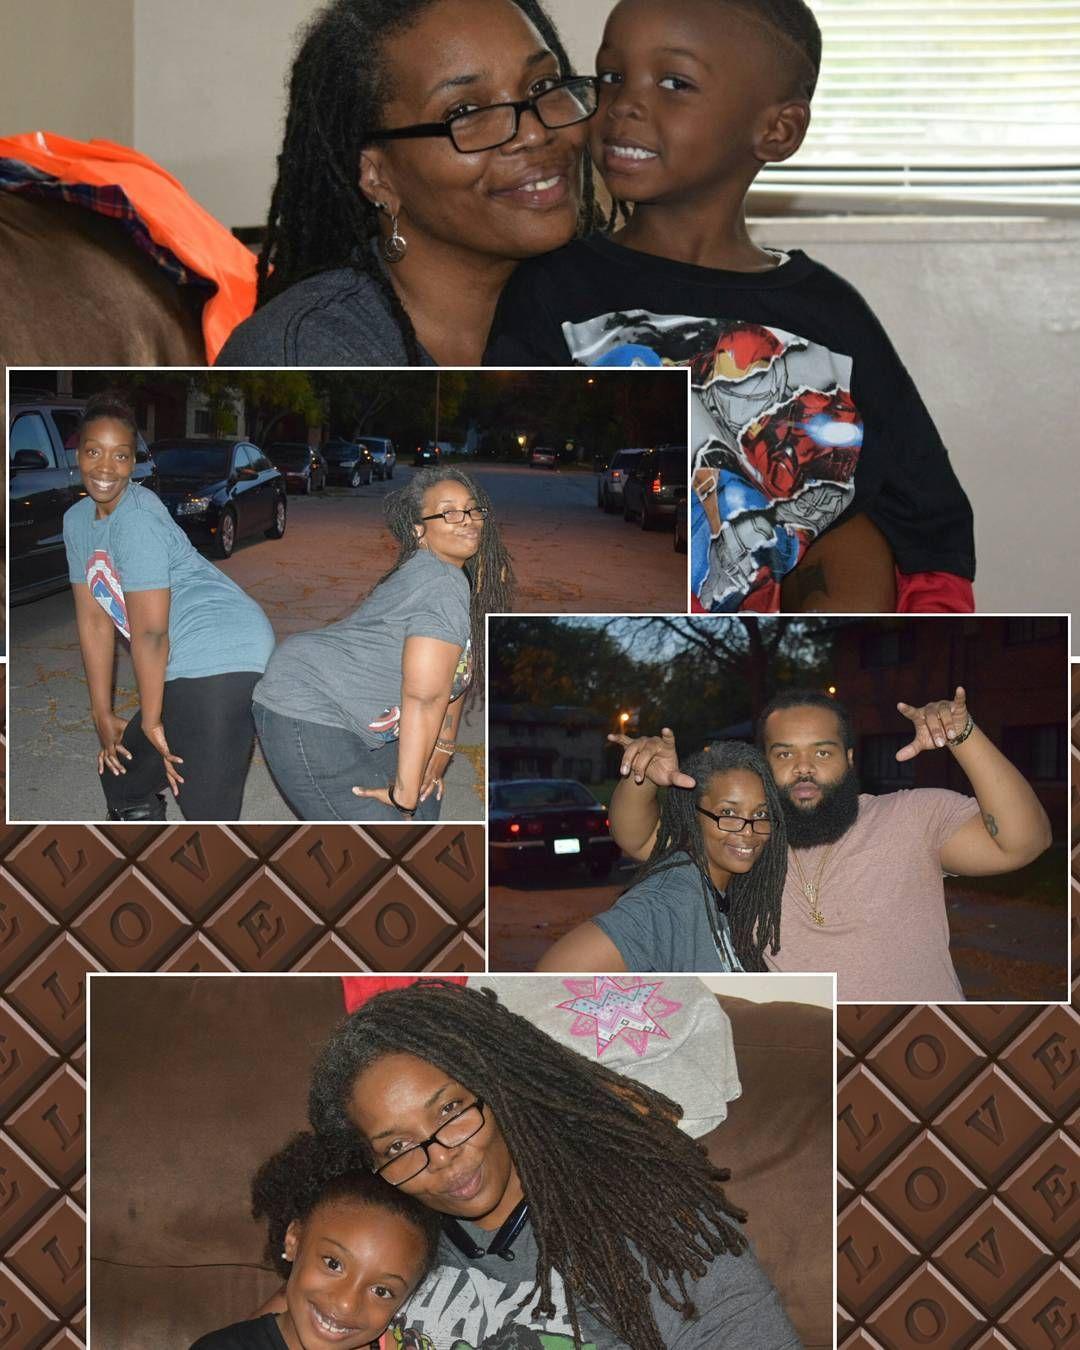 Suga Baby Ryan thanks everyone for the birthday wishes.  #BlackFamily #BlackLove #BeautifulIsBlack #MyGrayHairIsBeautiful #readventures #reathegal #readagal